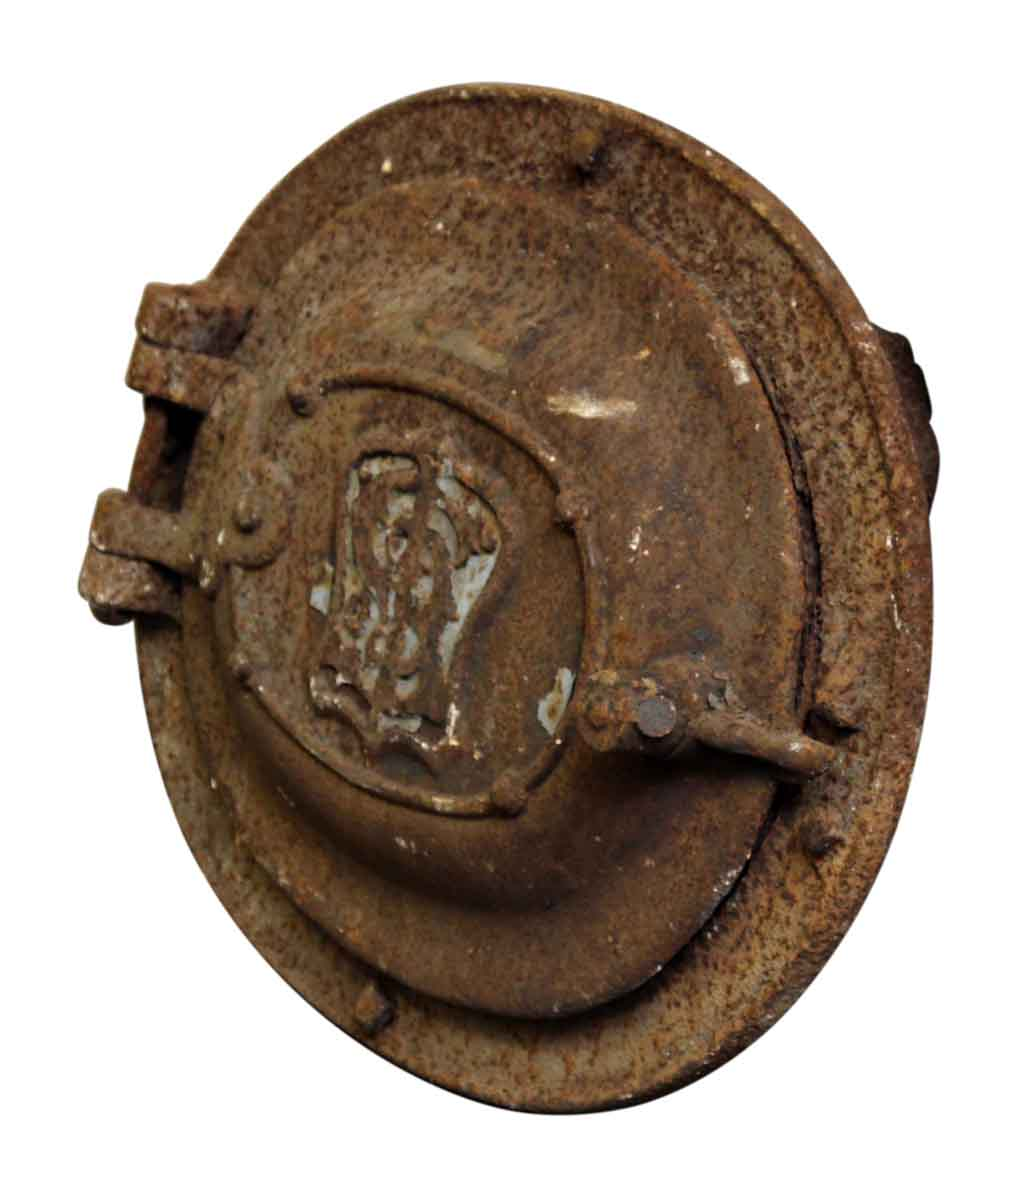 Antique Cast Iron Rusted Furnace Door  sc 1 st  Olde Good Things & Antique Cast Iron Rusted Furnace Door   Olde Good Things